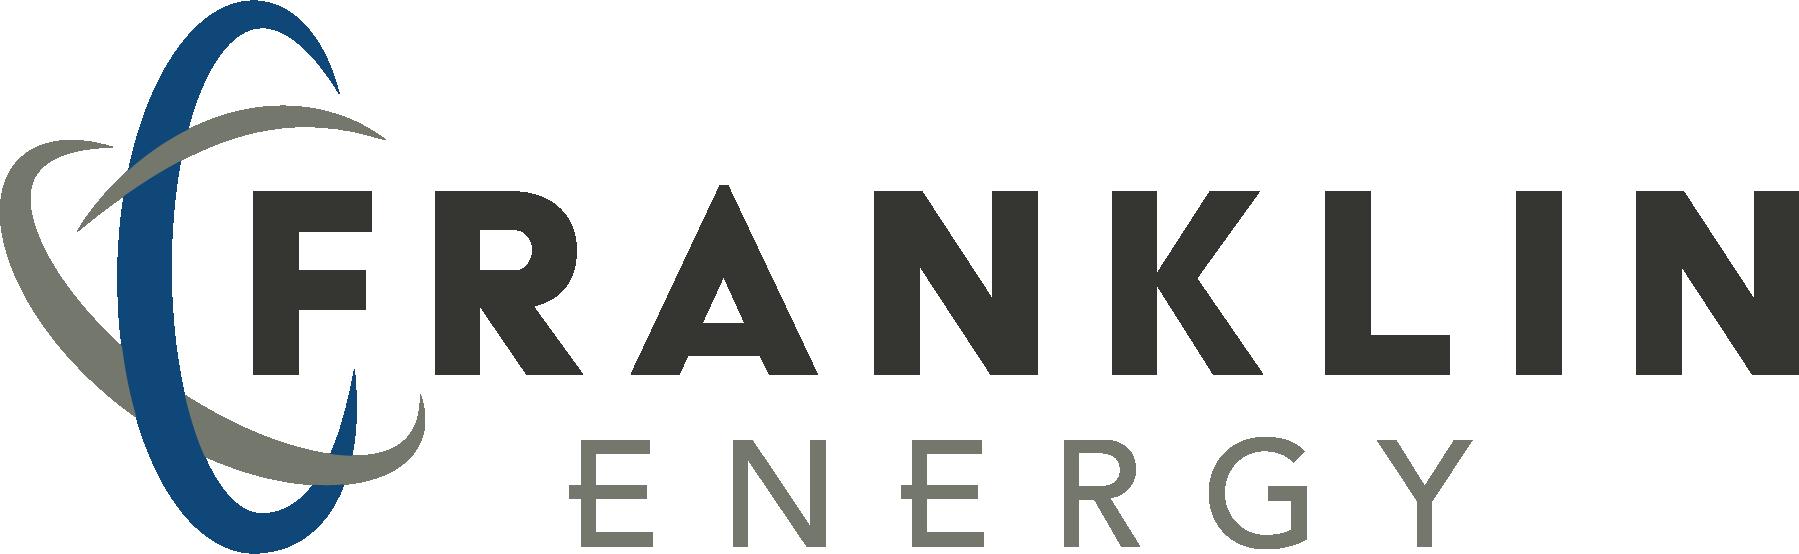 Franklin Energy logo